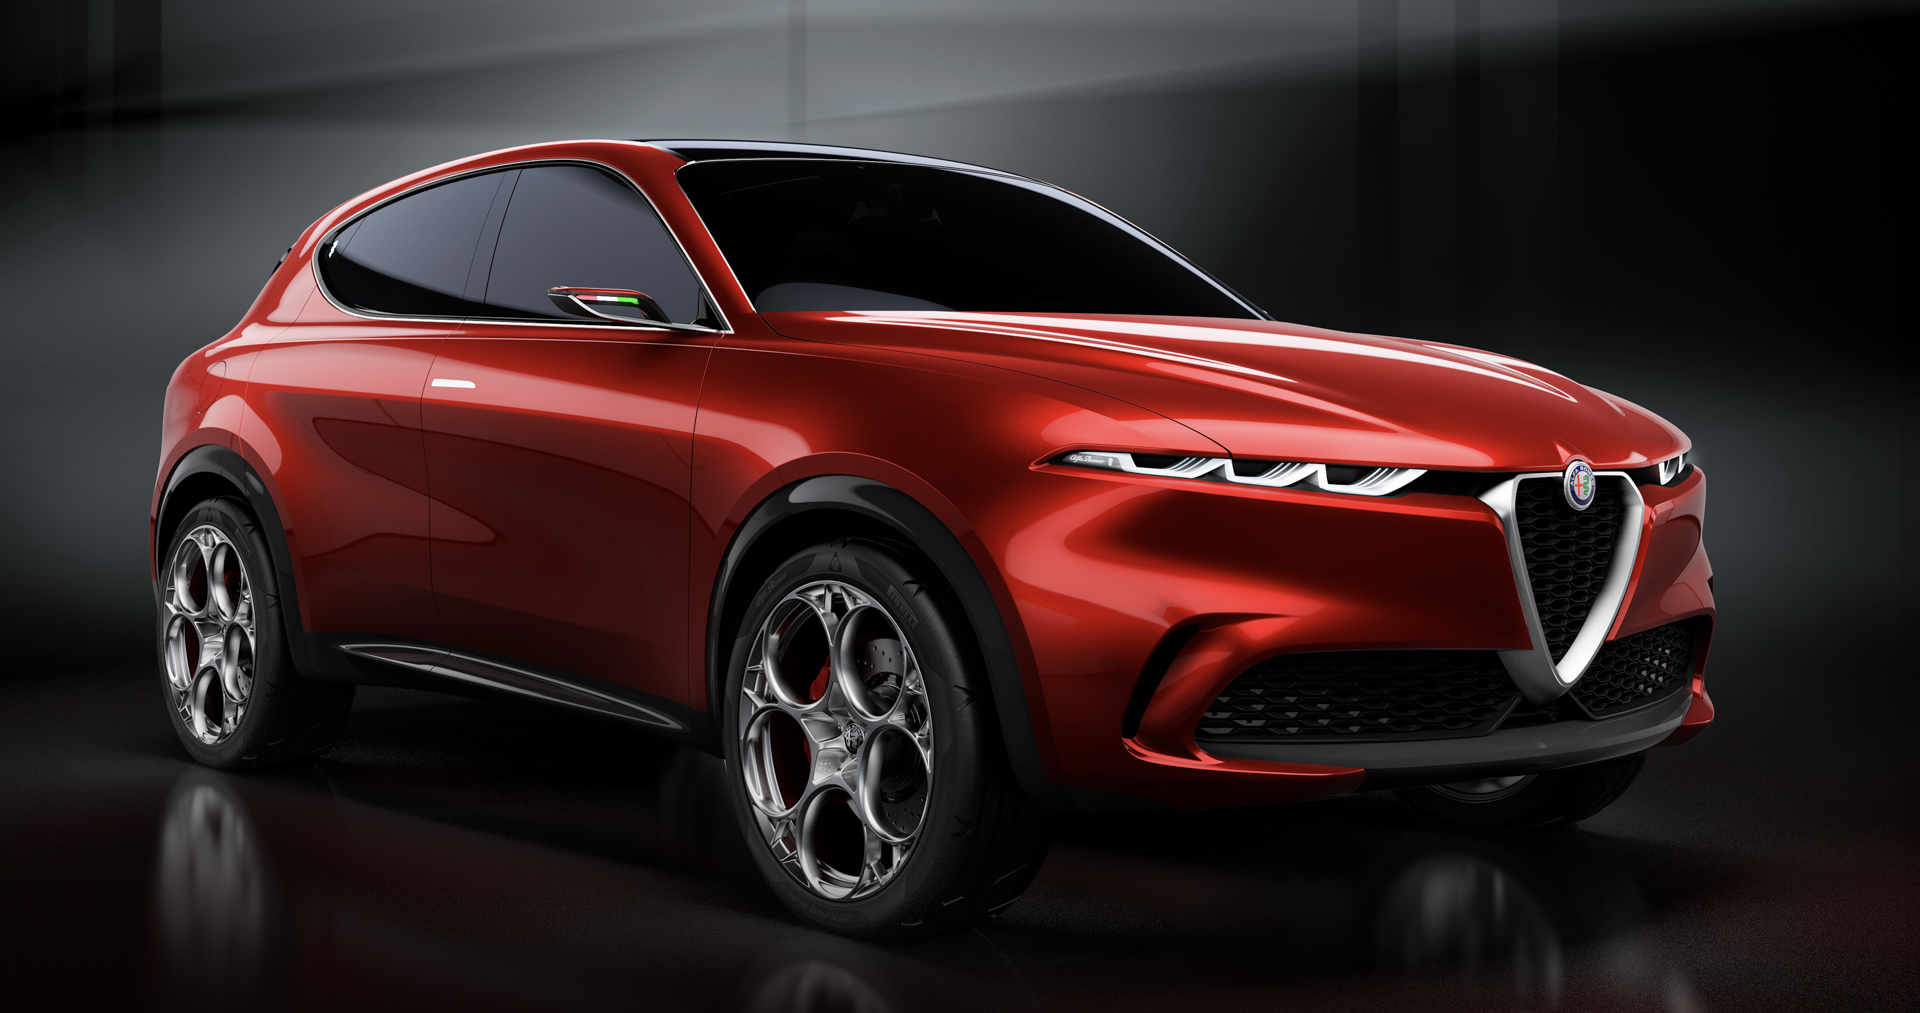 Alfa Romeo Tonale Concept 6 of 7